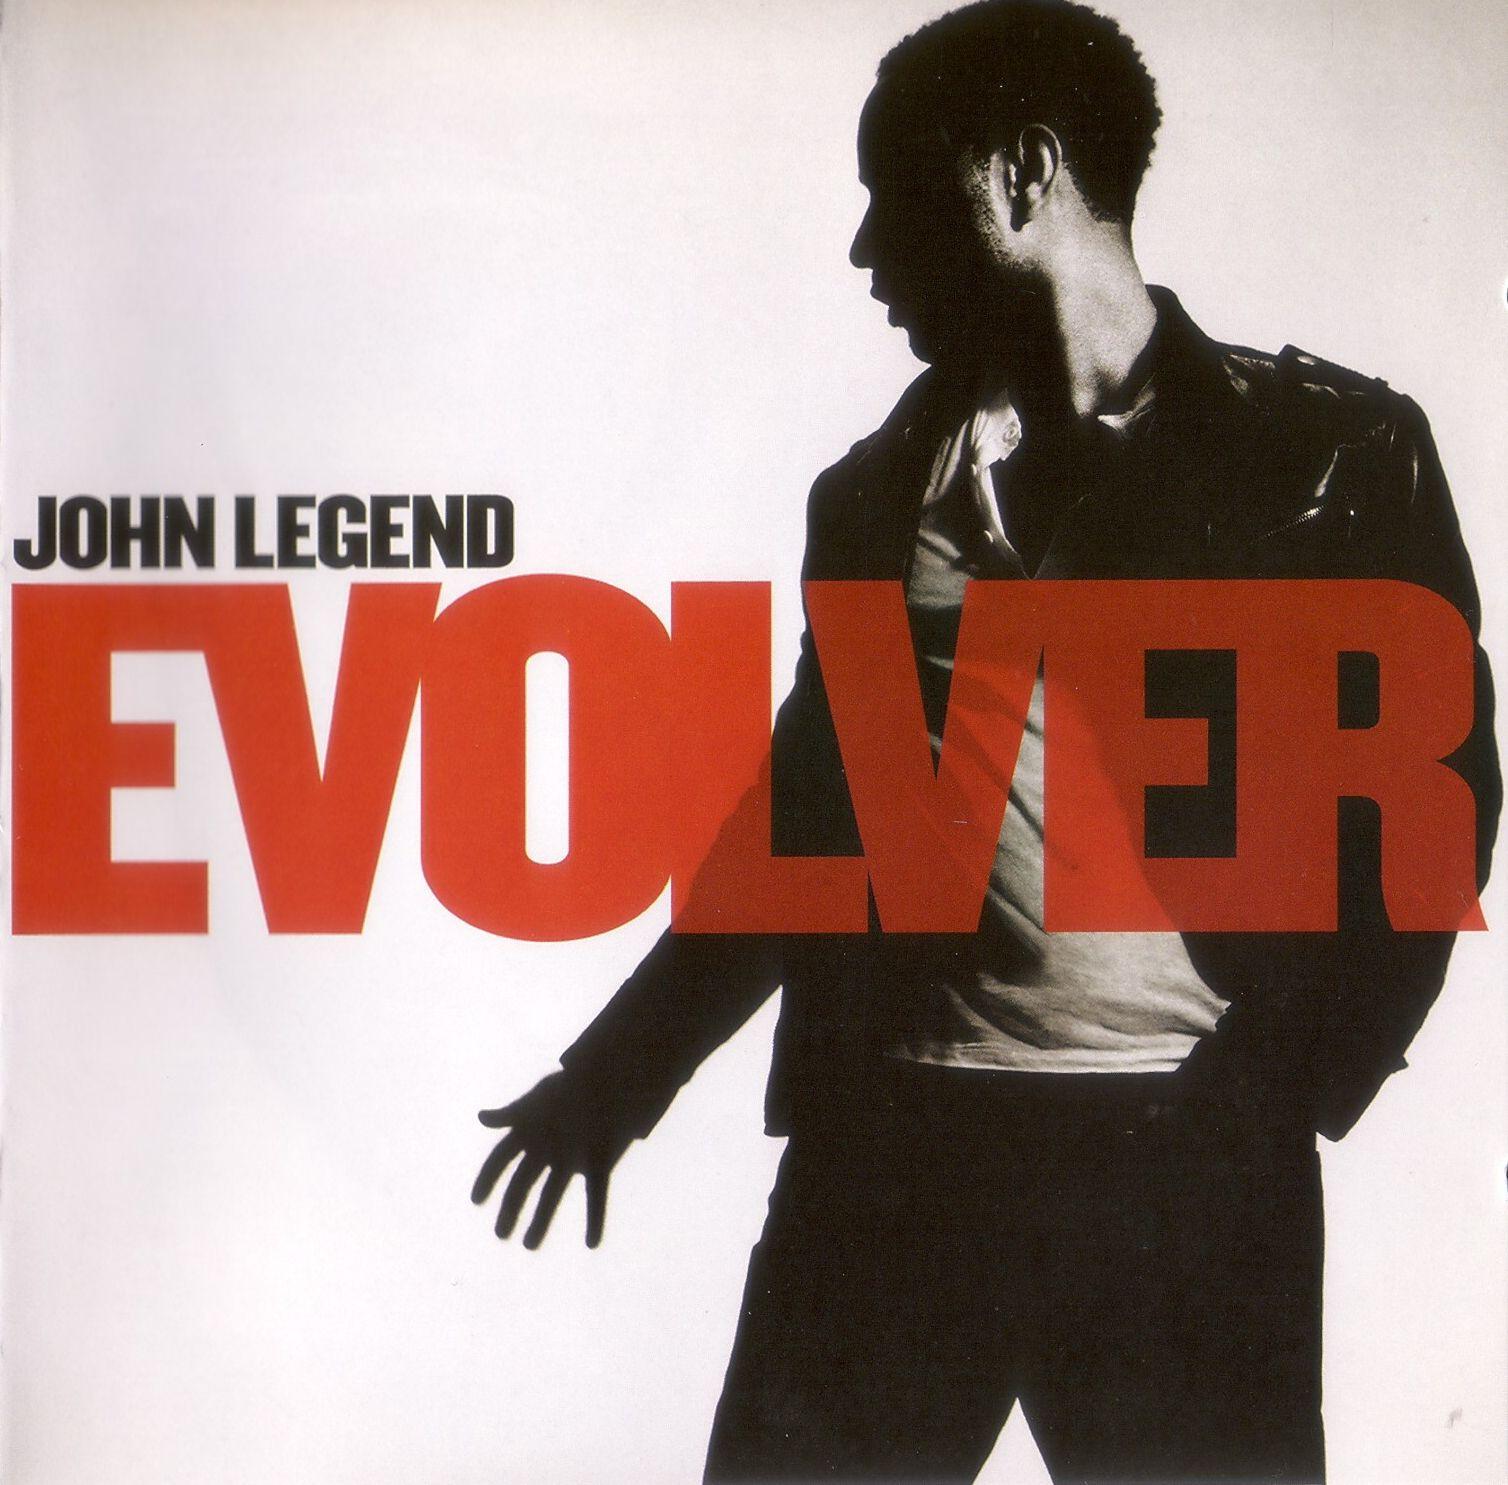 John Legend - Evolver album cover